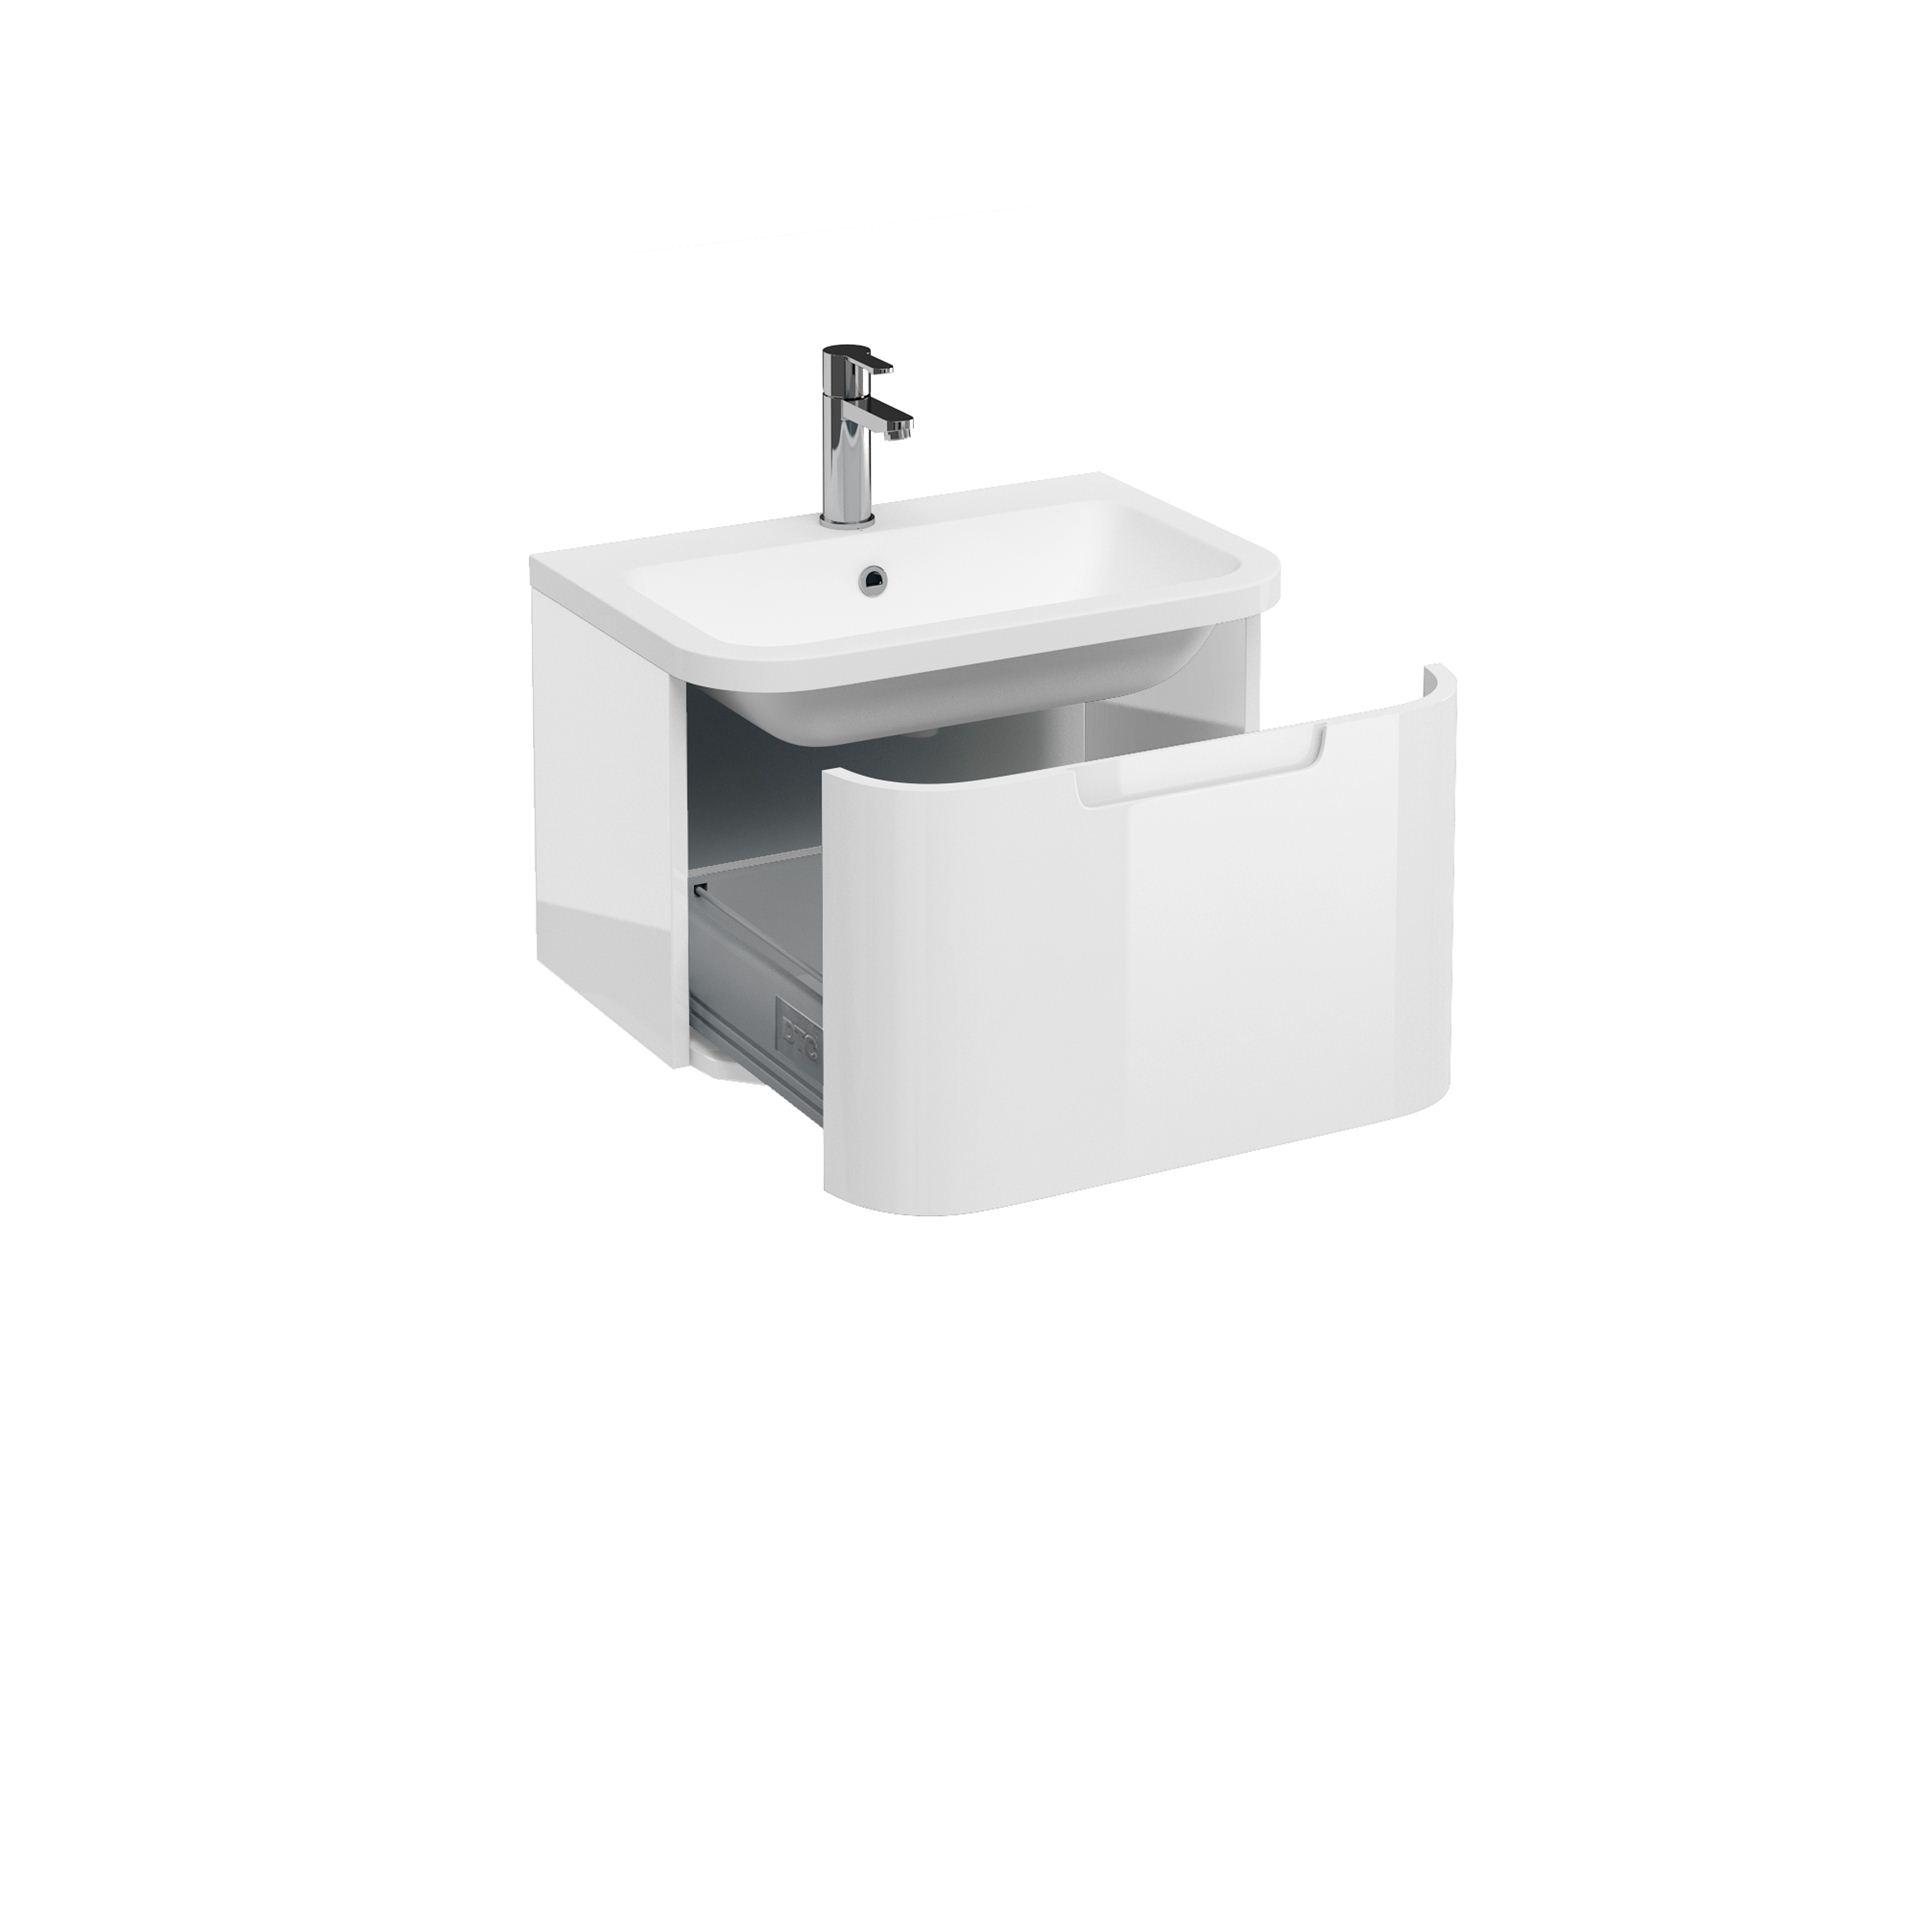 Aqua Compact 600 Single Drawer Wall Hung Vanity Unit With